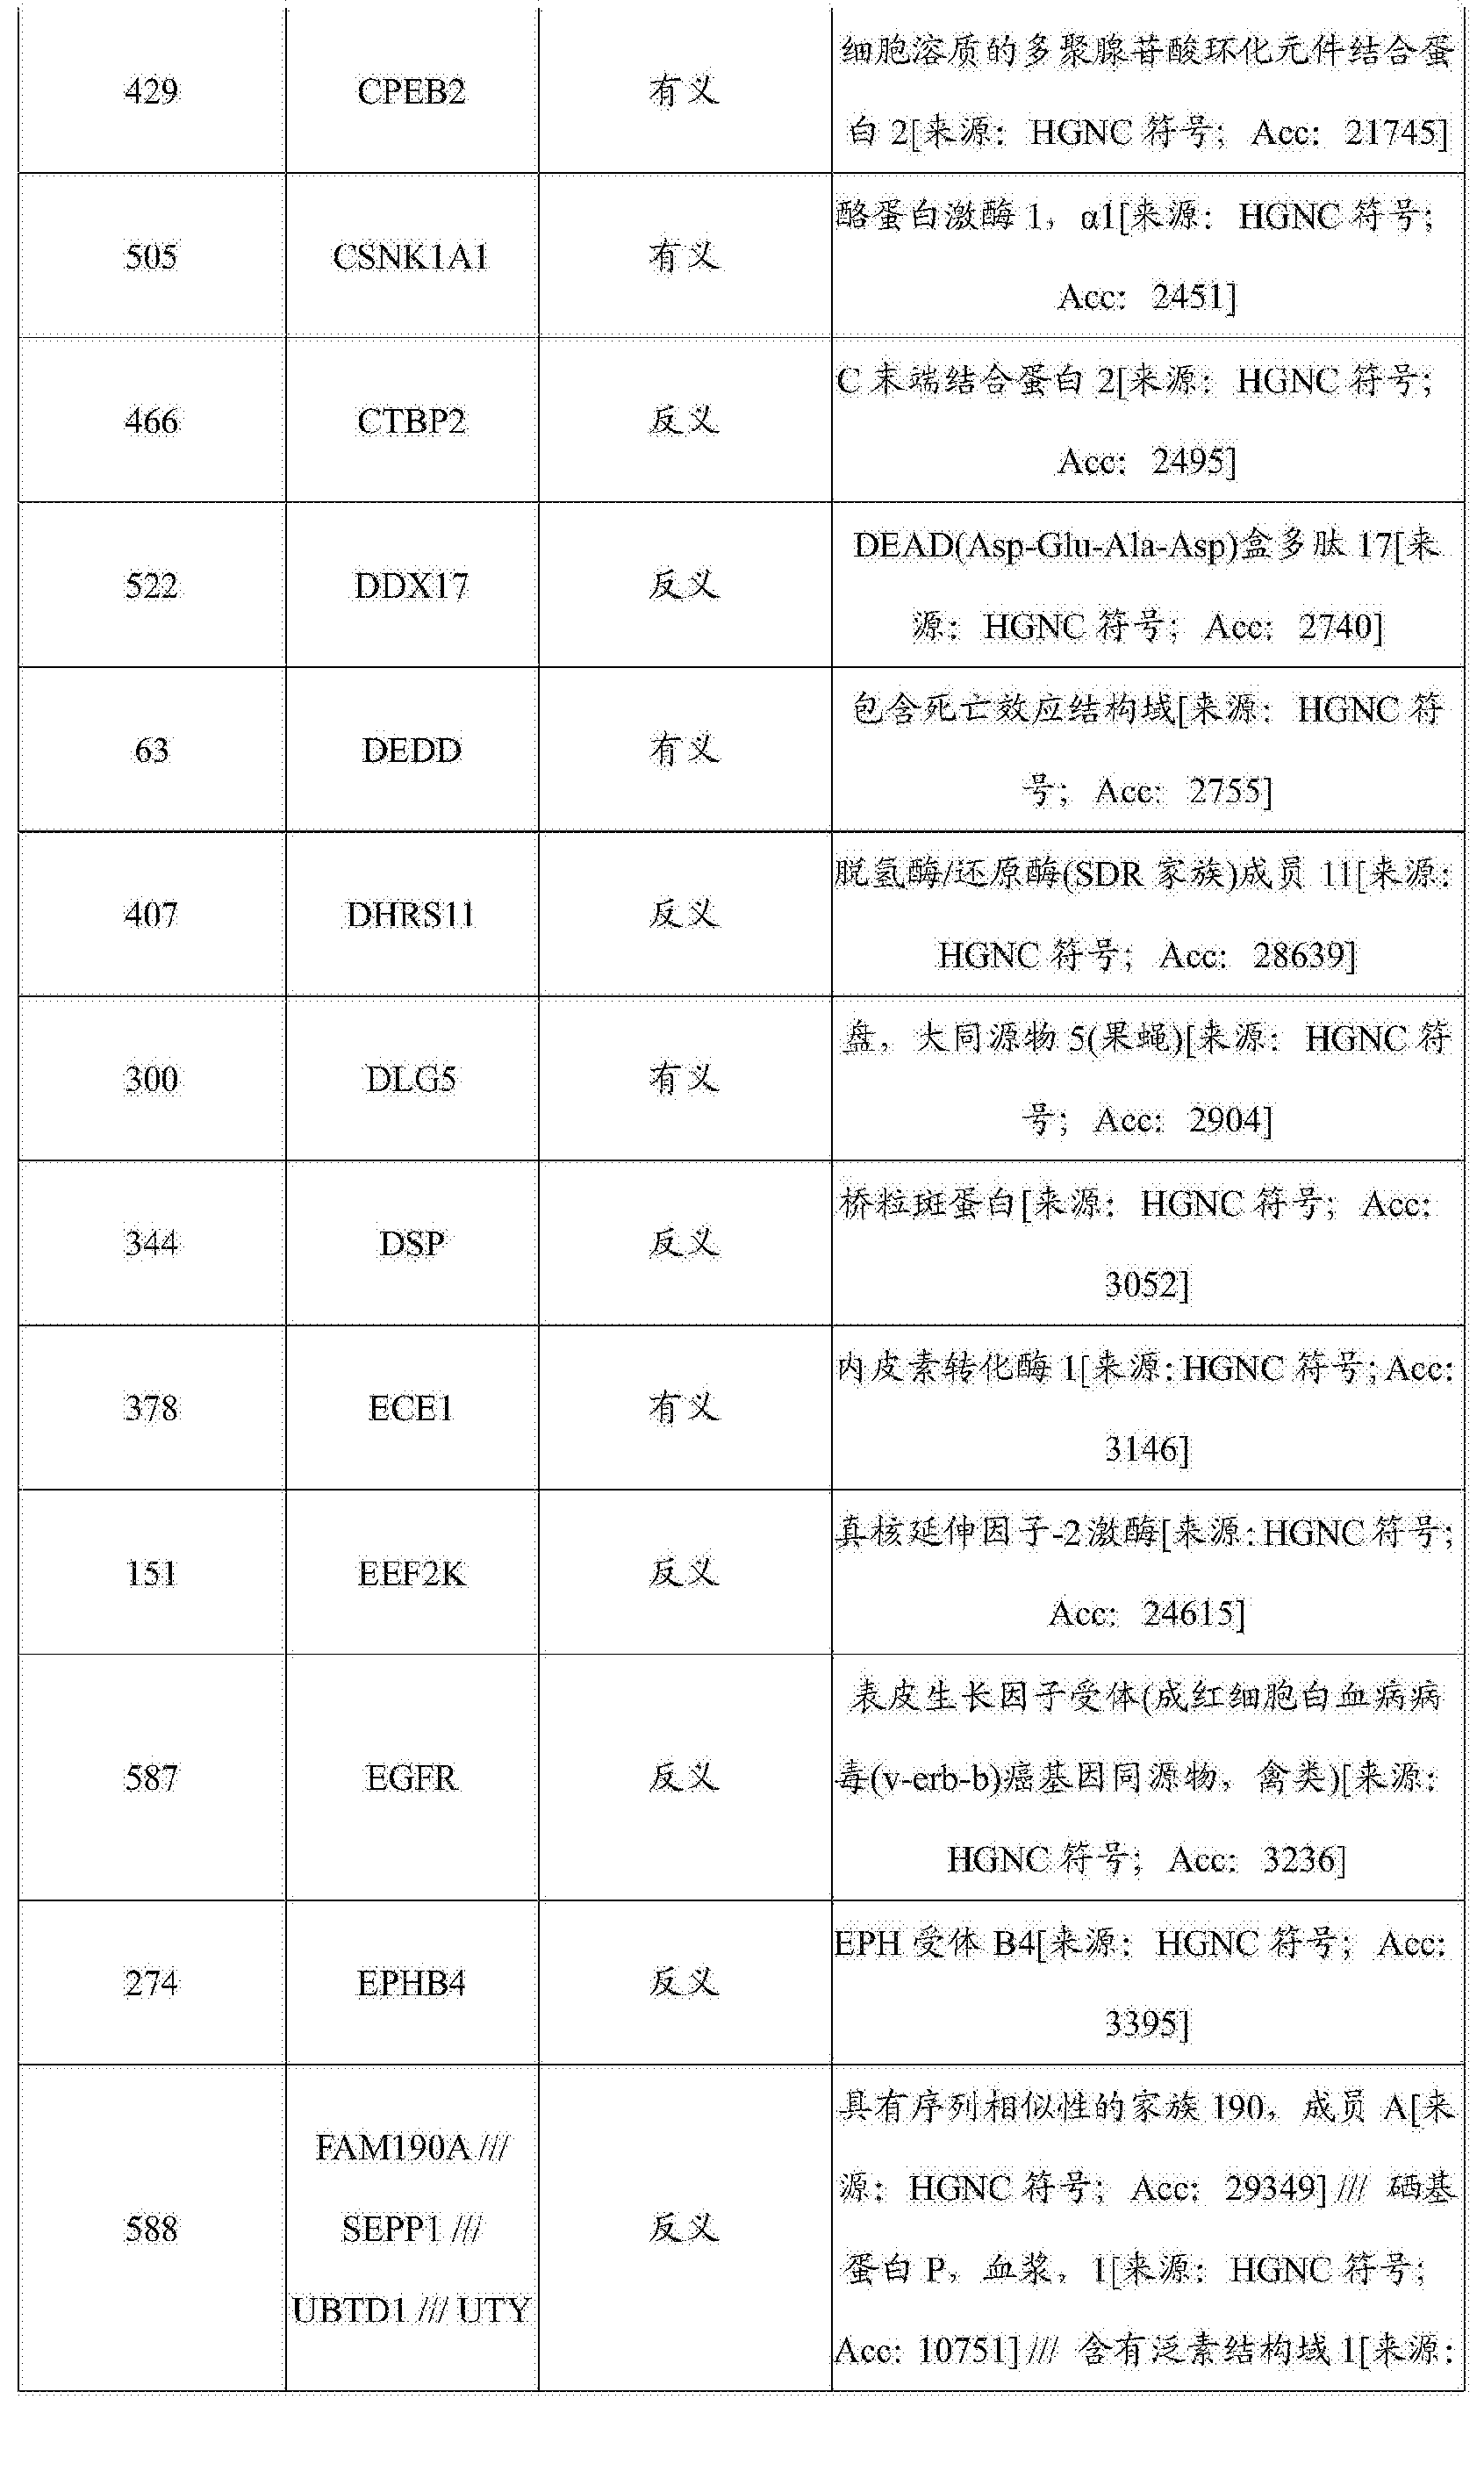 Figure CN103403543B9D00271